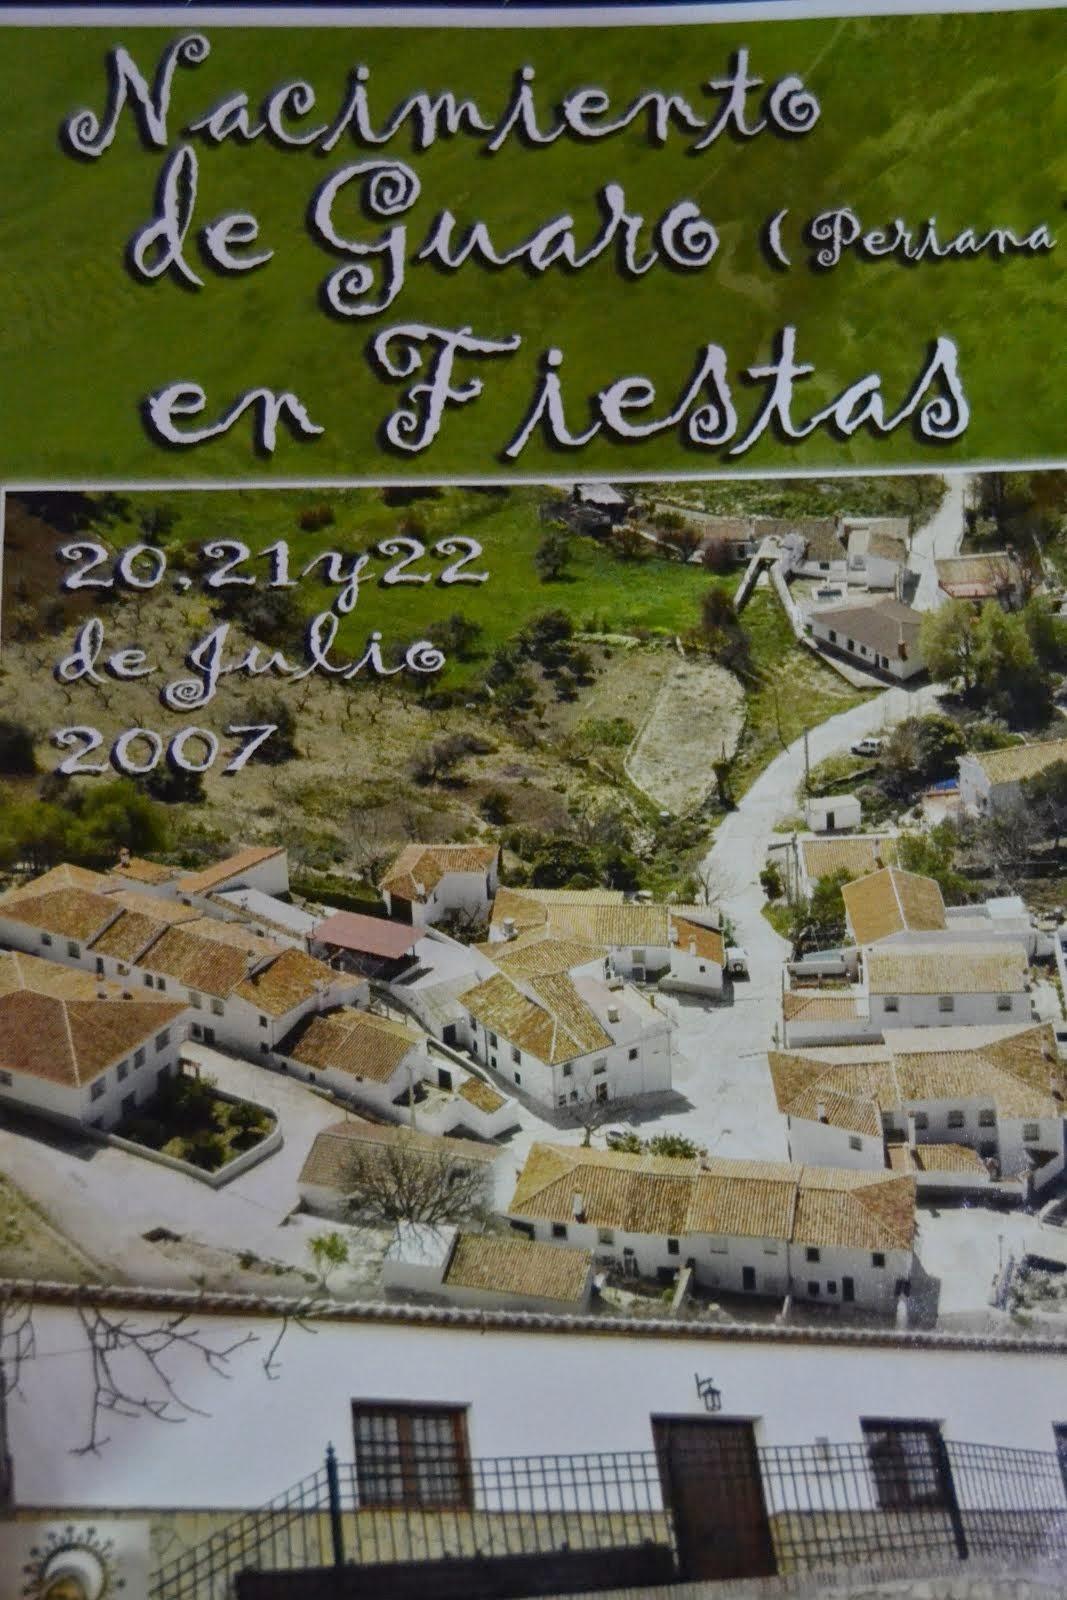 FERIA DE GUARO 2007